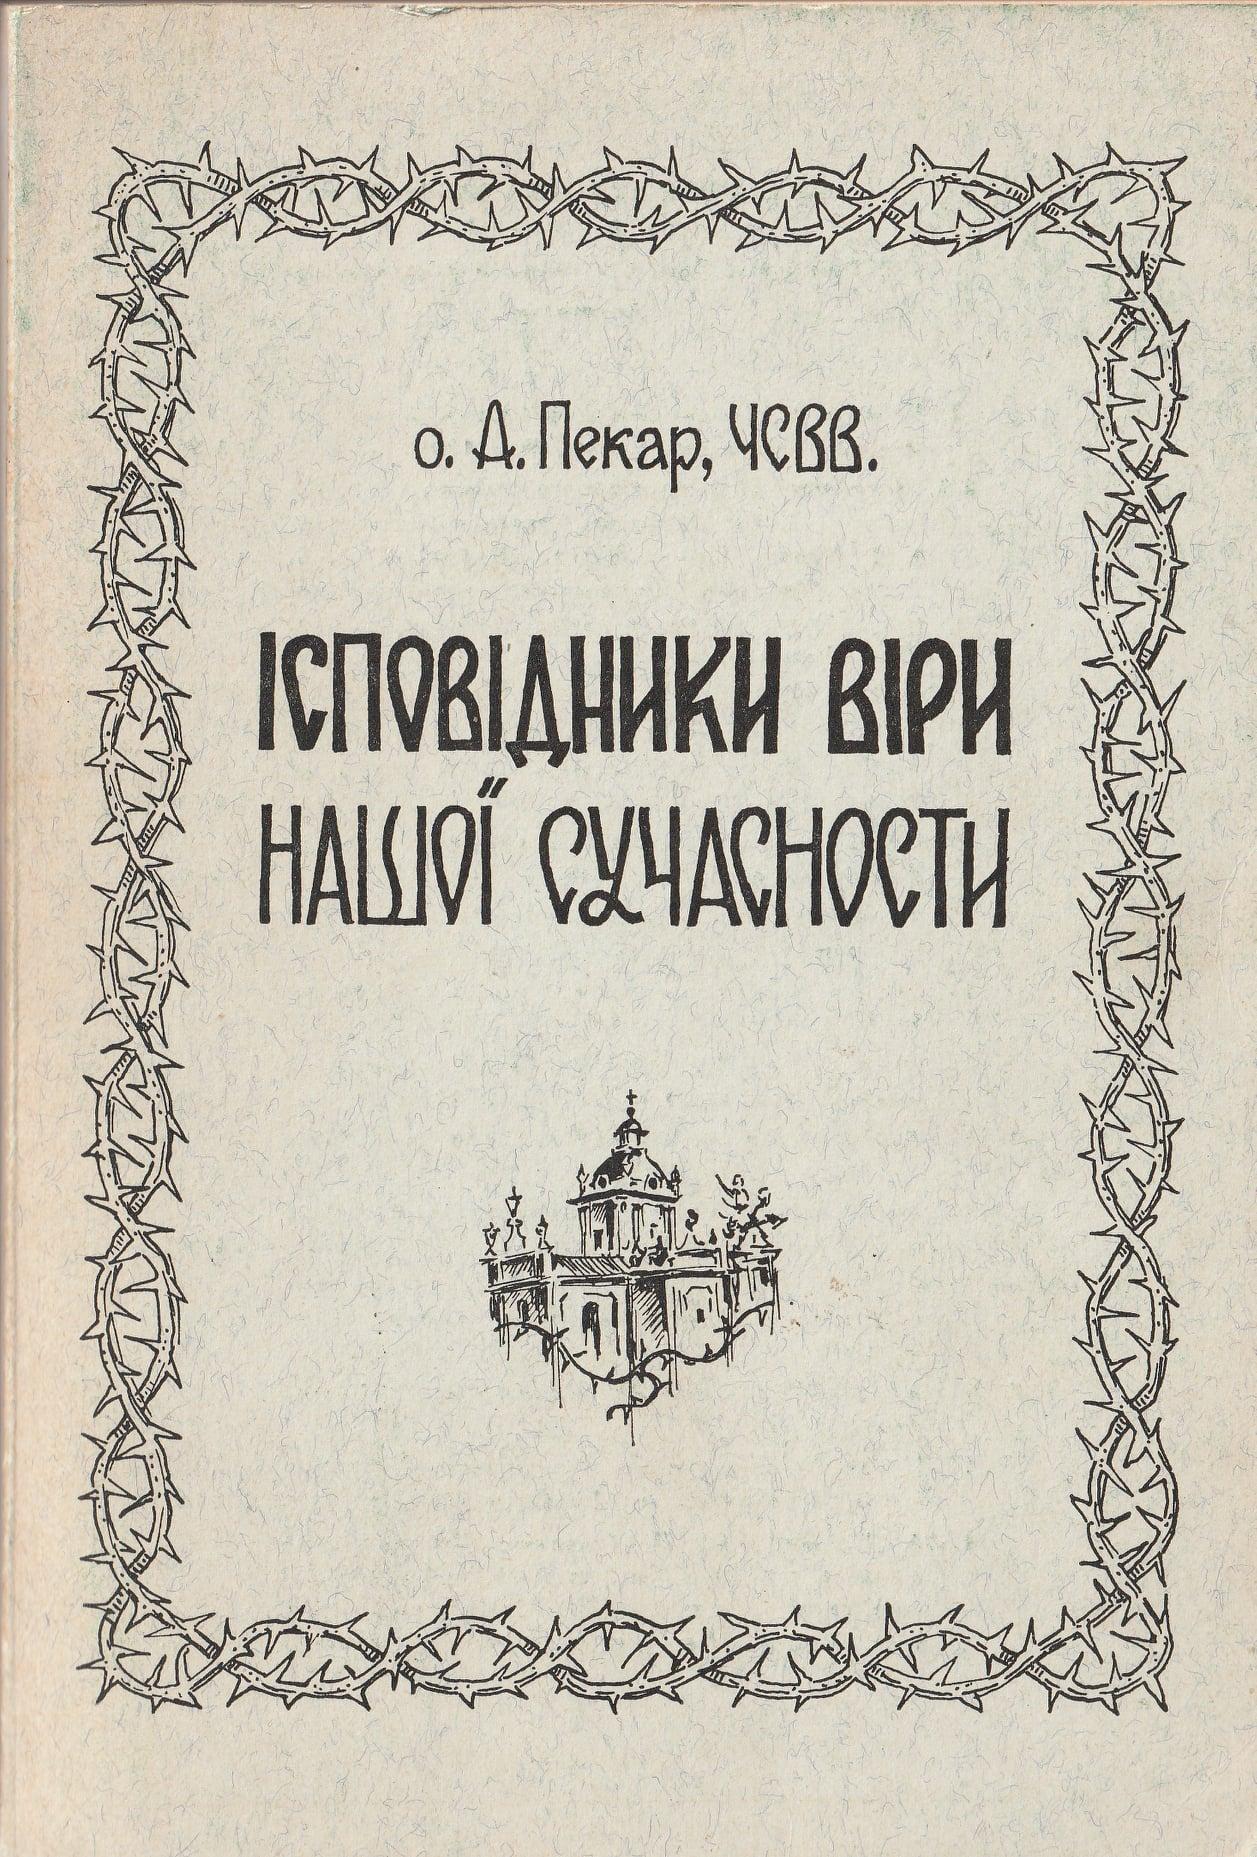 о. Атанасій Пекар, ЧСВВ: Батько о. Августин Волошин - жертва большевицького терору